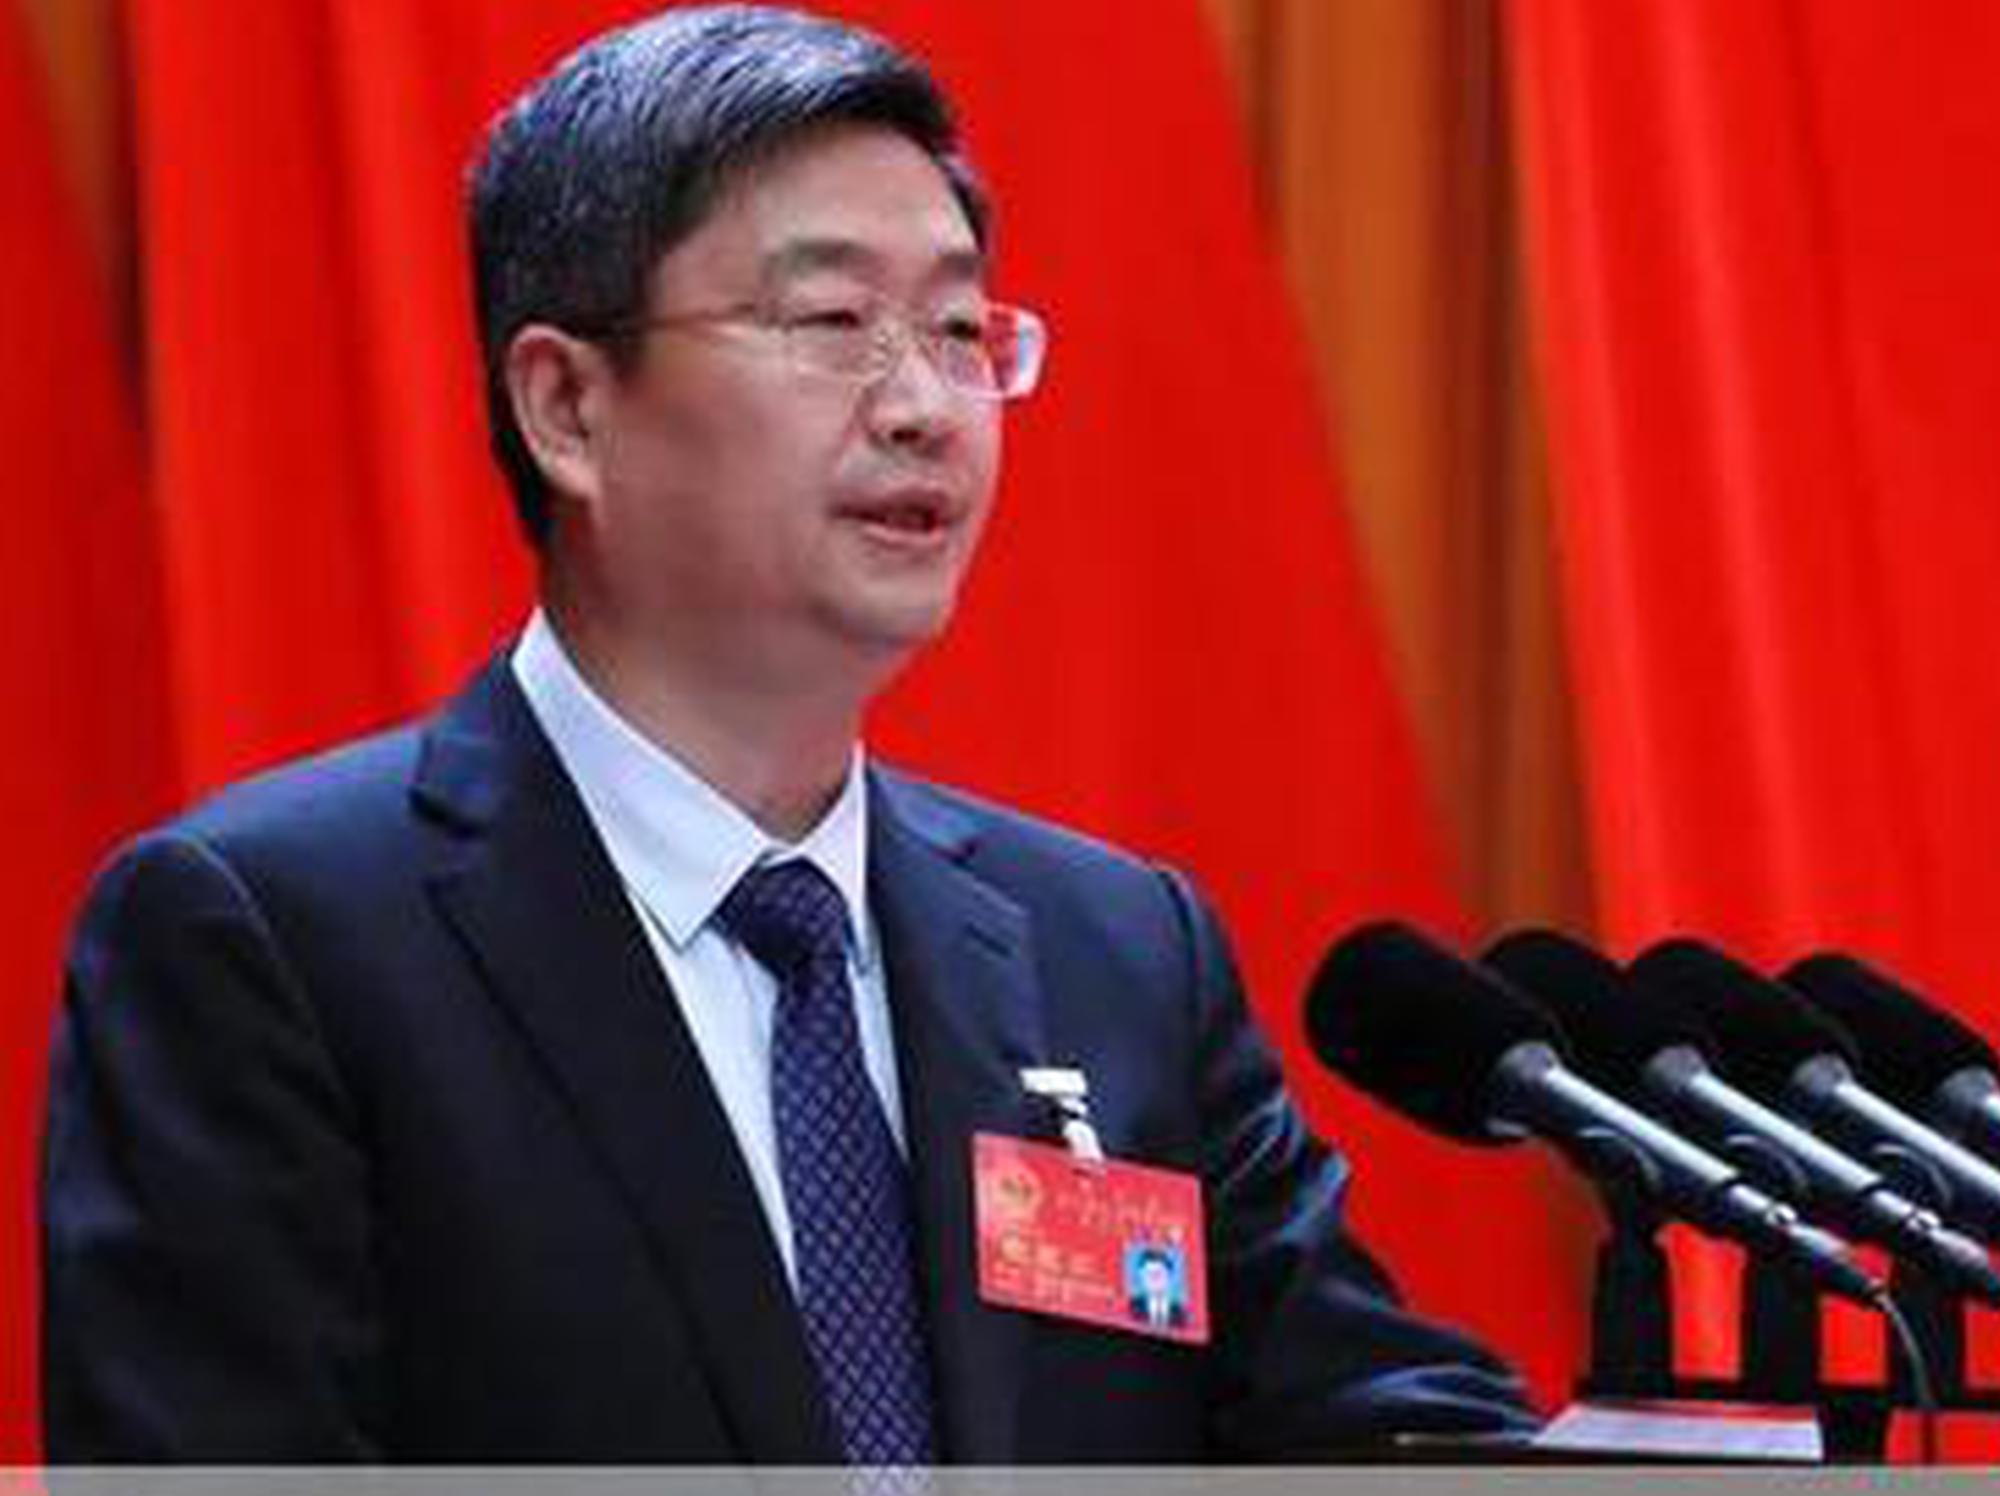 http://ah.sina.com.cn/news/2021-01-18/detail-ikftpnnx8895579.shtml